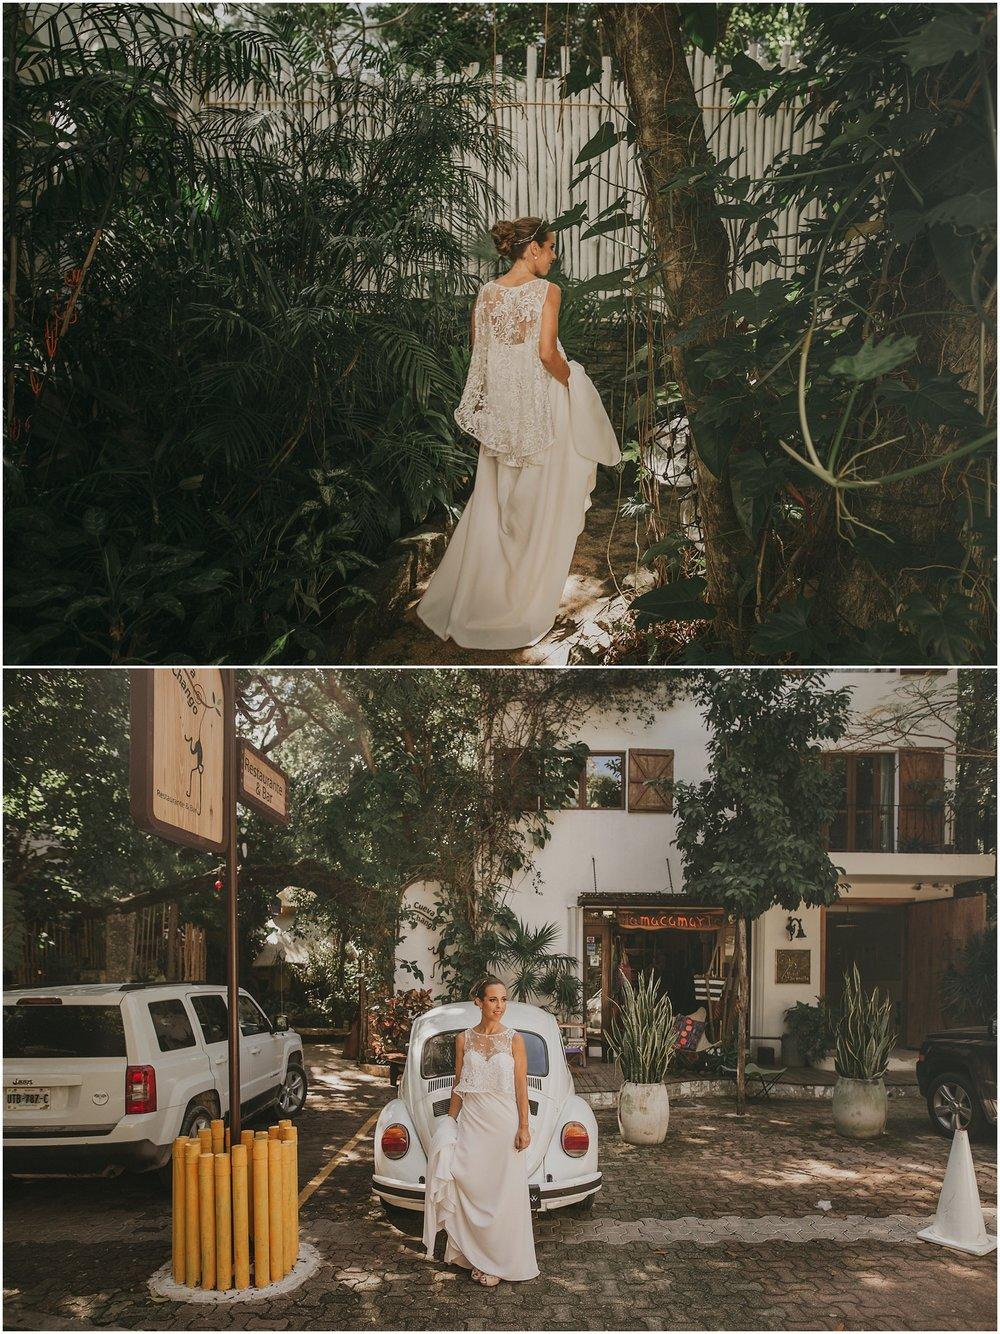 Pablo Laguia wedding photographer 037.jpg